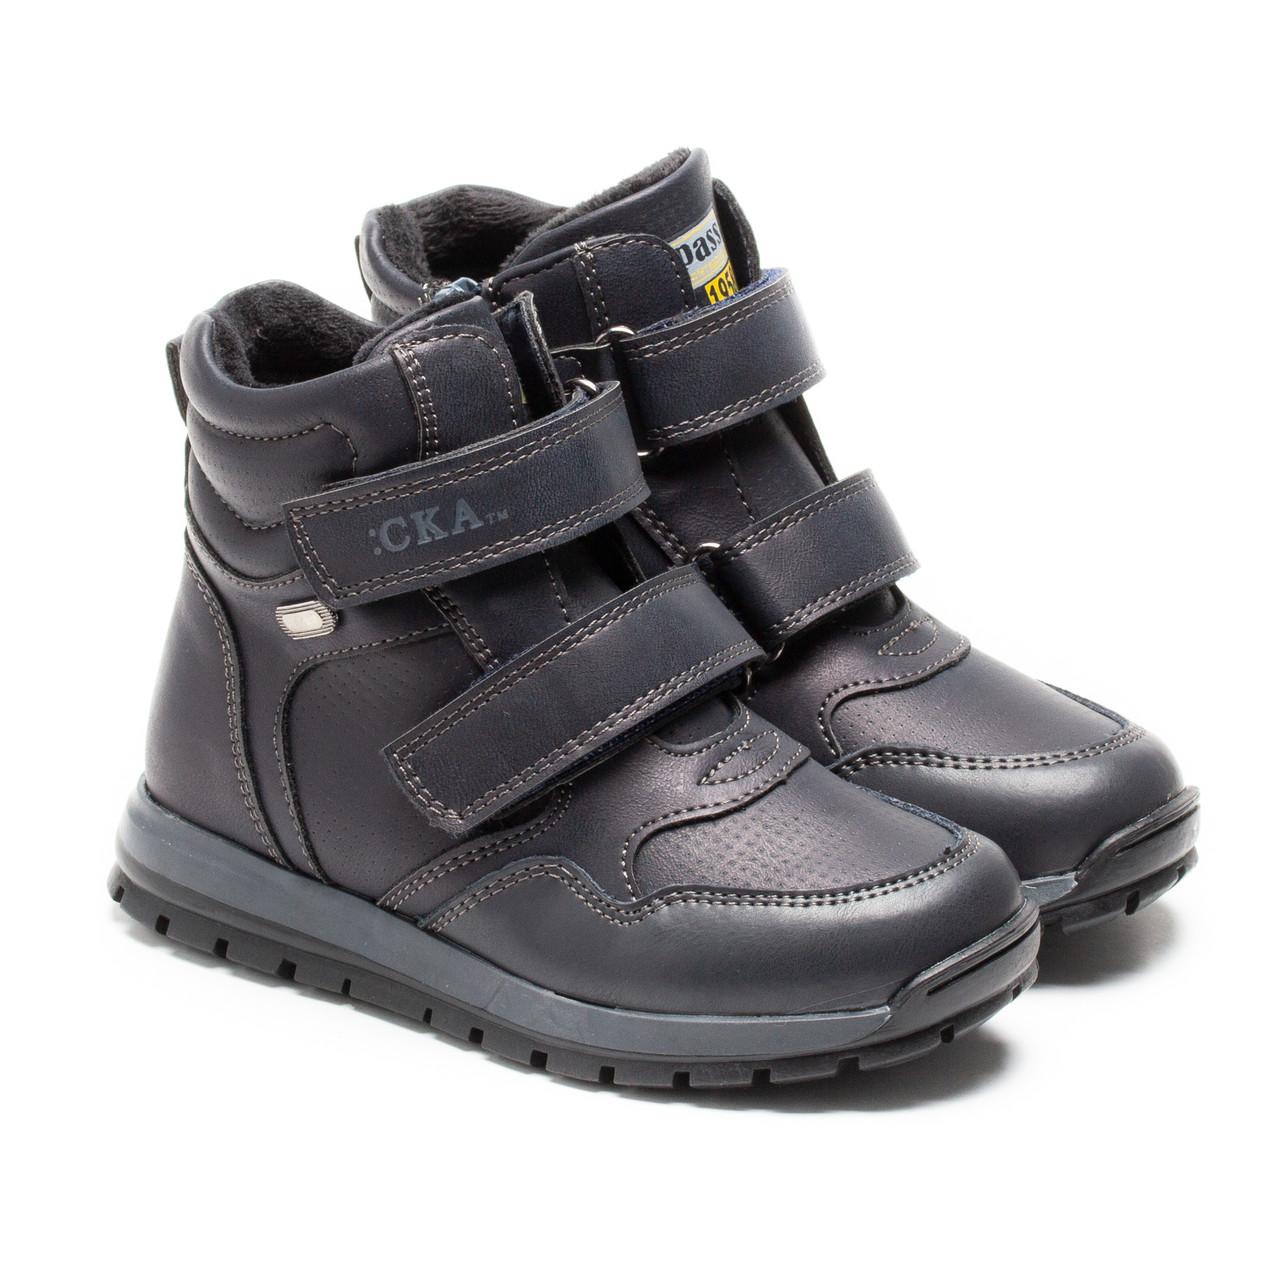 f53f05754e50fe Детские осенние ботинки для мальчика ТМ